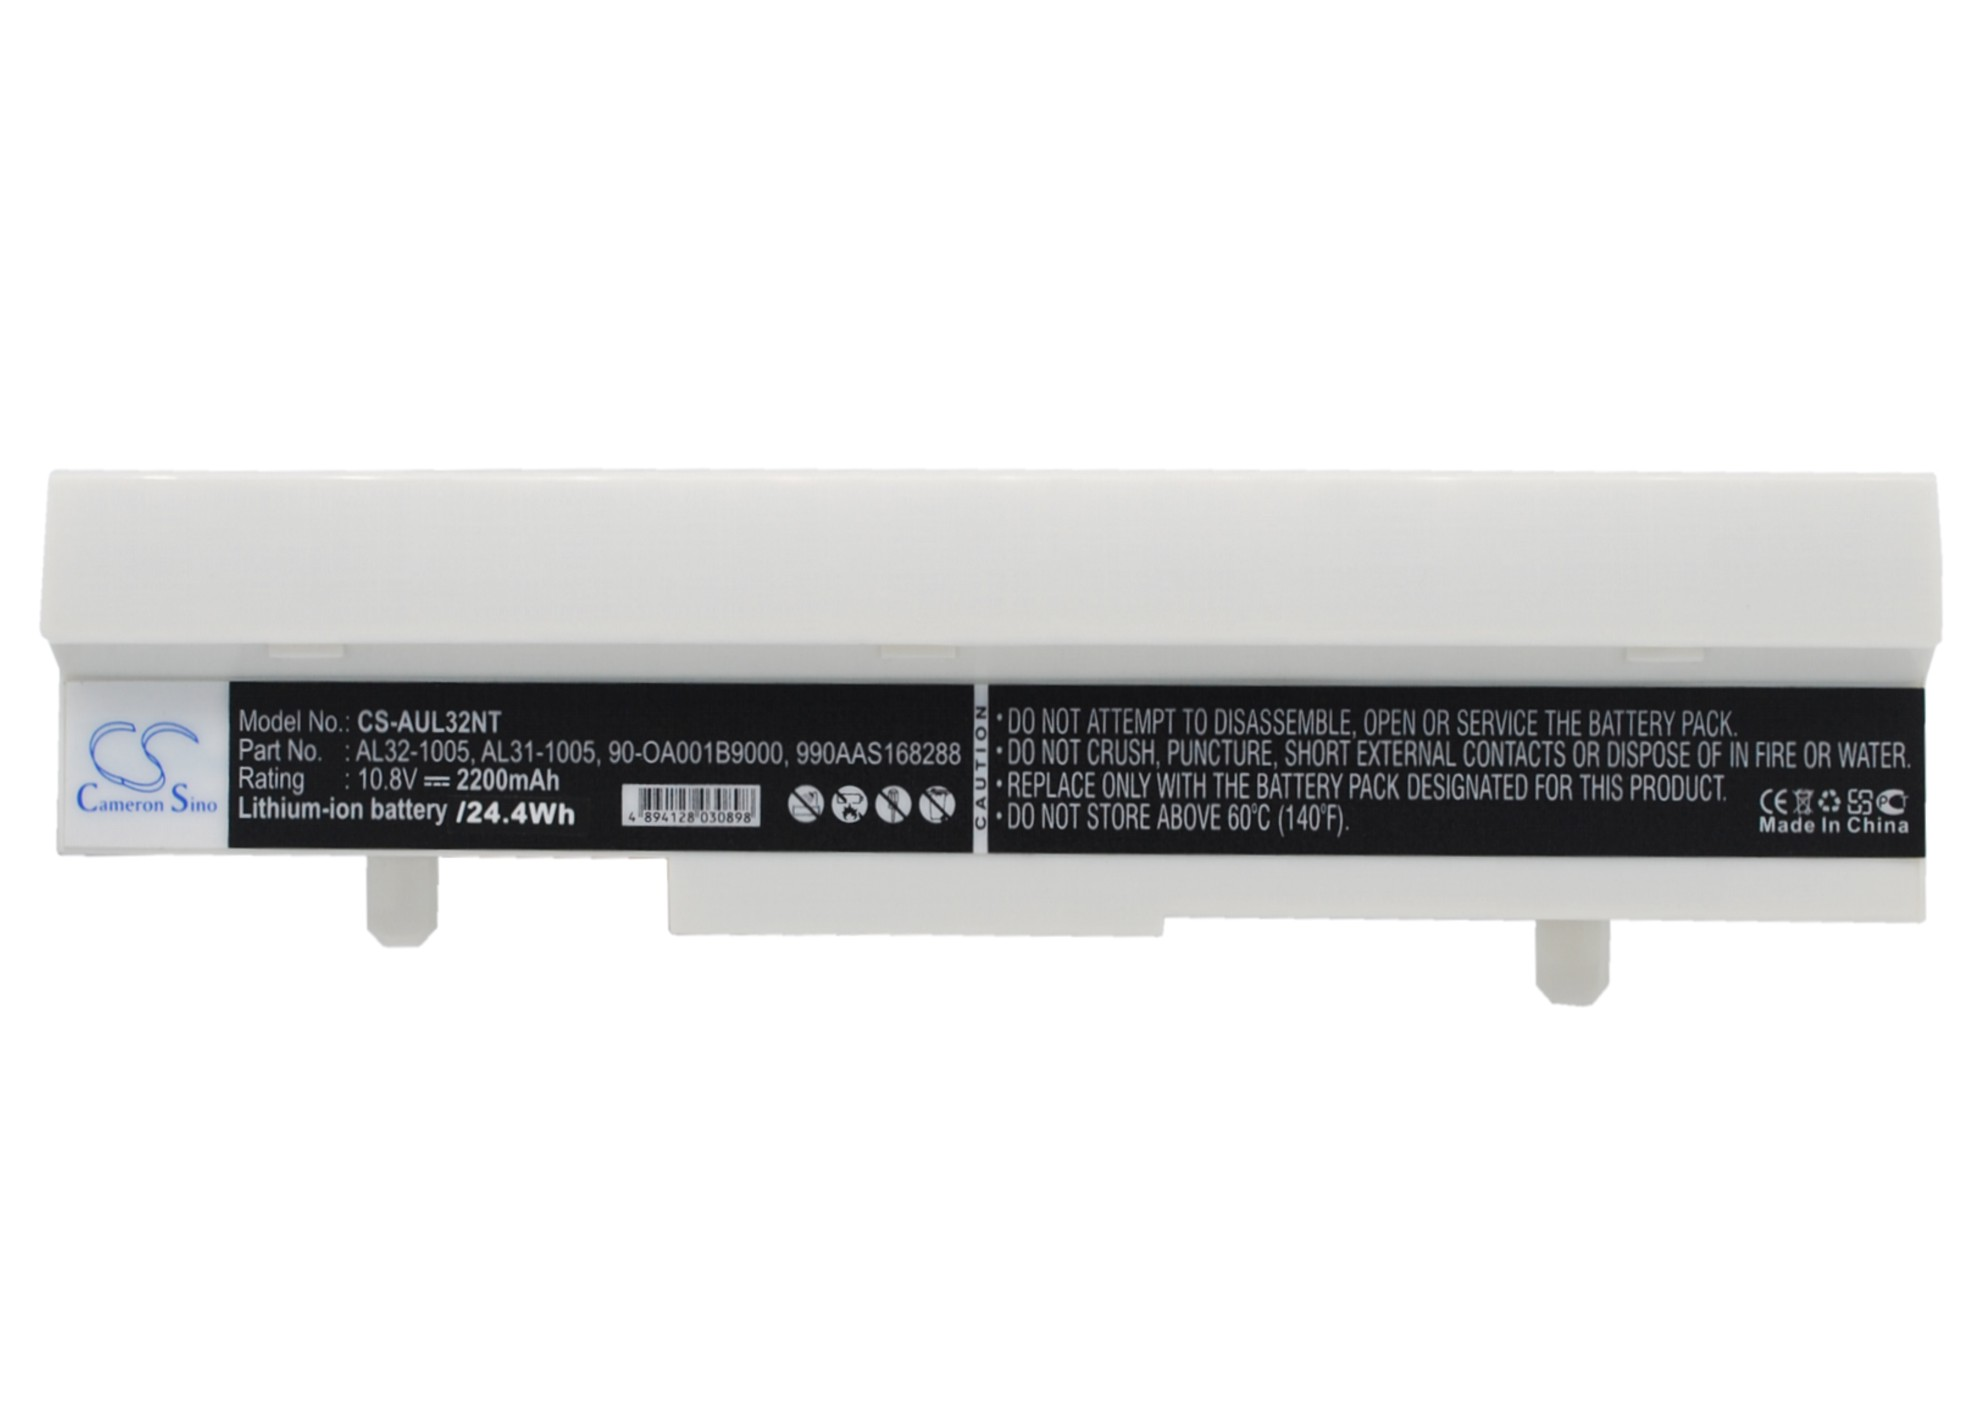 Cameron Sino baterie do netbooků pro ASUS Eee PC 1001HA 10.8V Li-ion 2200mAh bílá - neoriginální